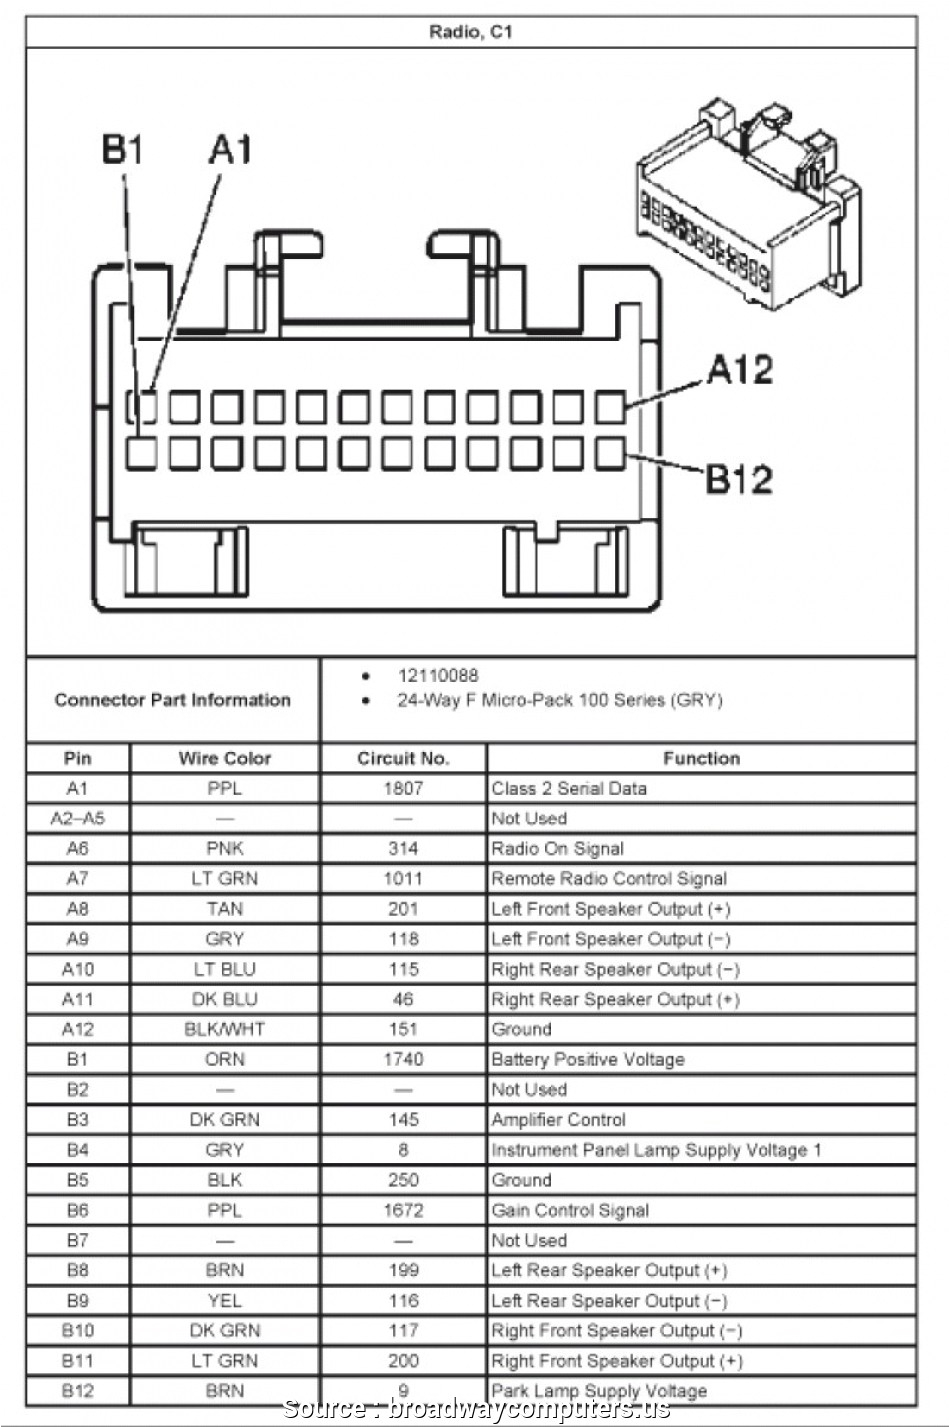 2002 gmc envoy bose stereo wiring diagram wiring diagram name 2002 gmc envoy headlight wiring diagram 2002 gmc envoy wiring